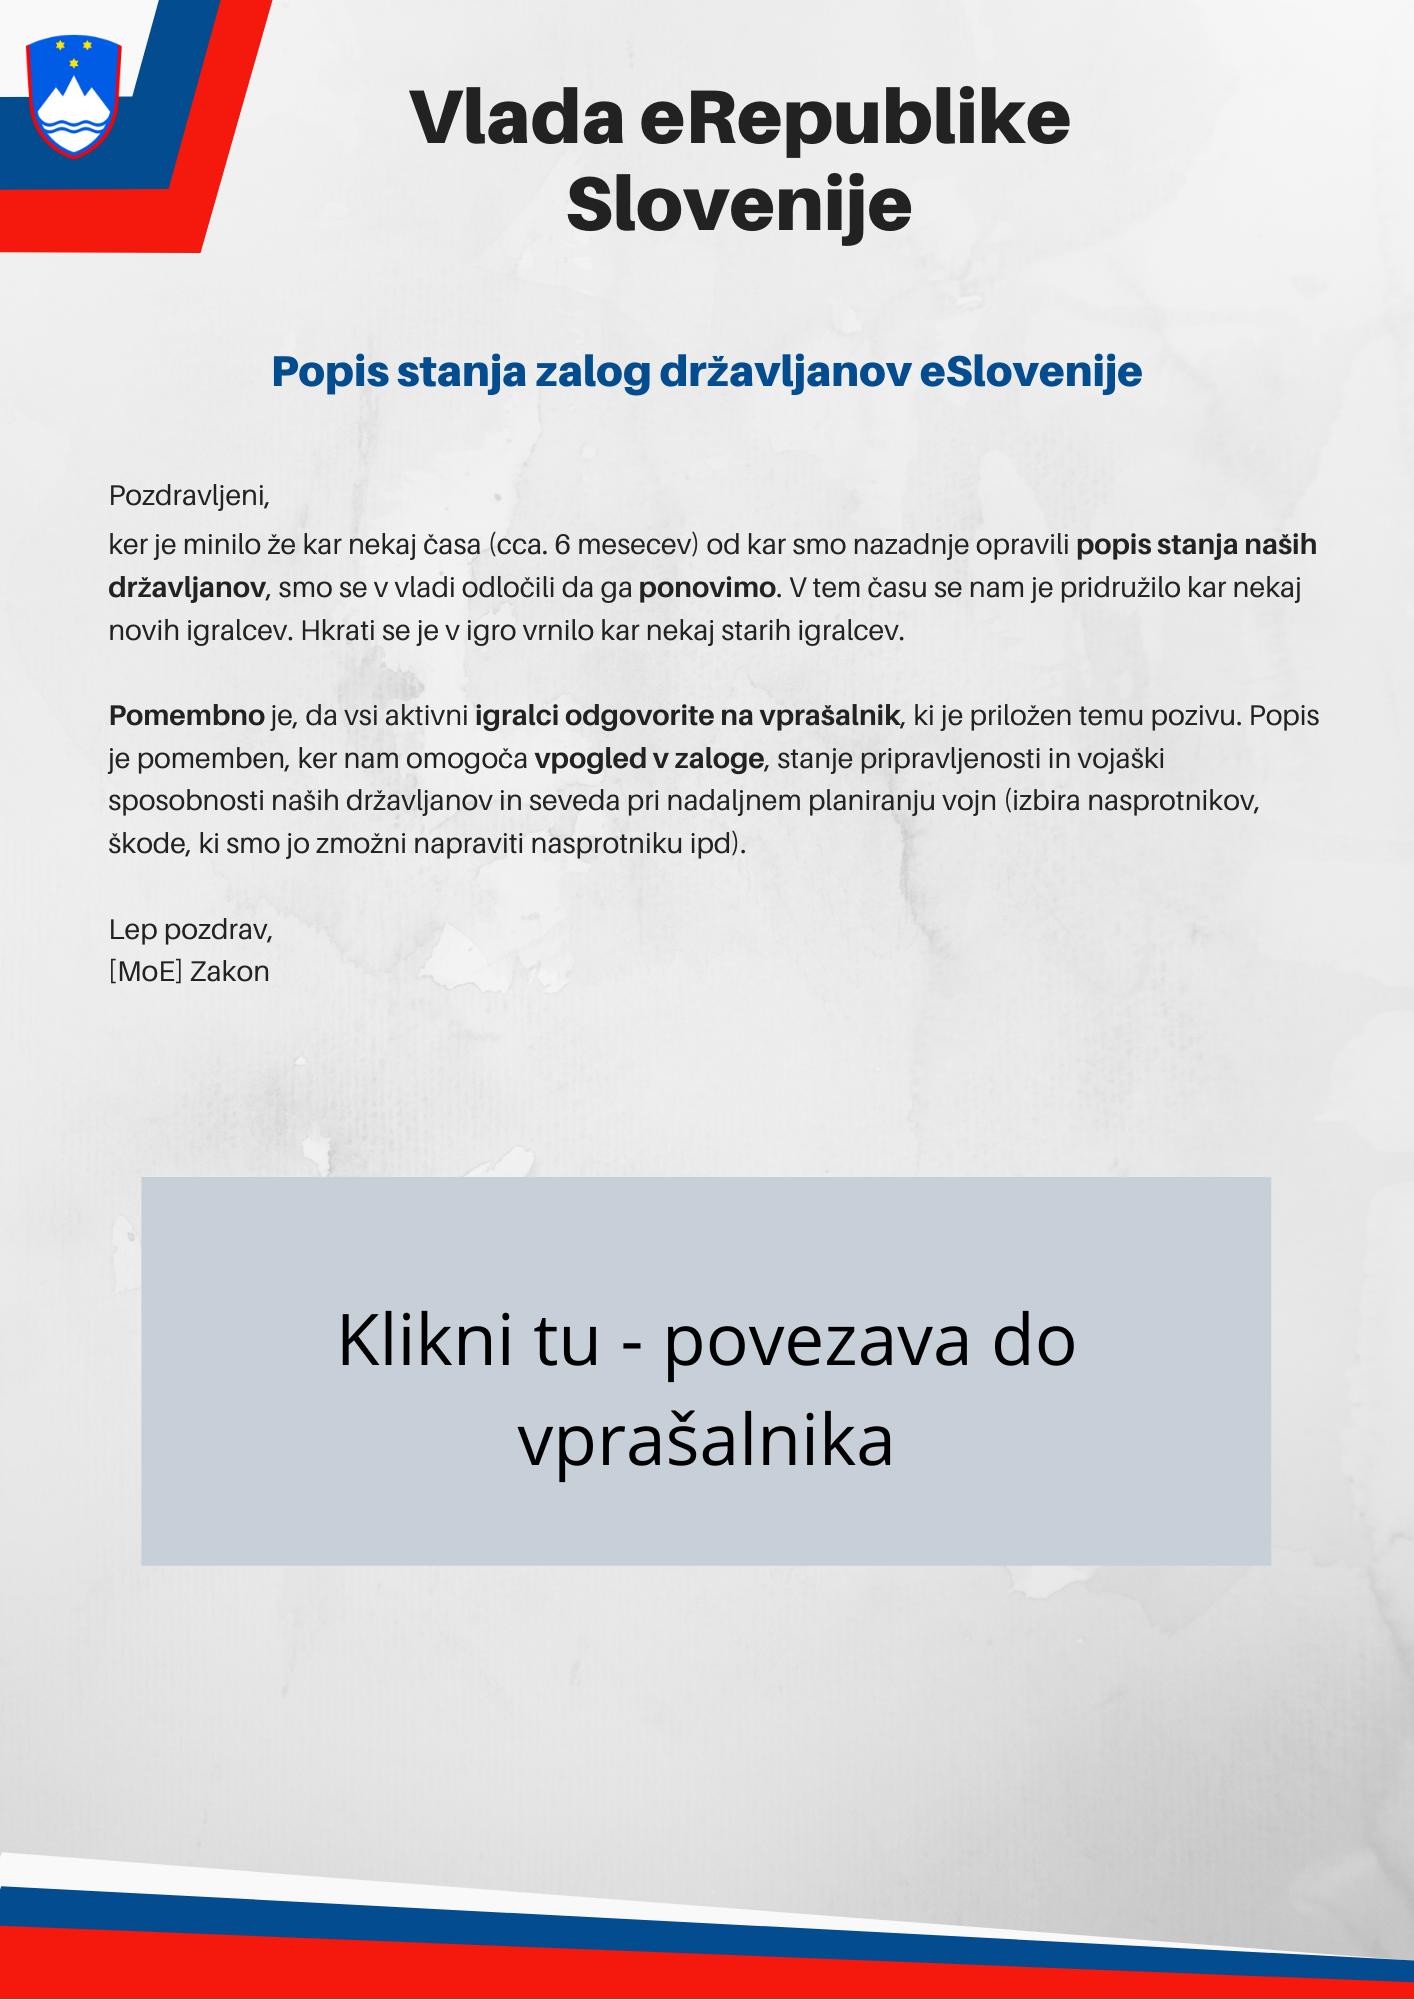 https://cdn.discordapp.com/attachments/673557130263134238/693870212000251954/Copy_of_Ministrstvo_za_izobrazevanje_2.png